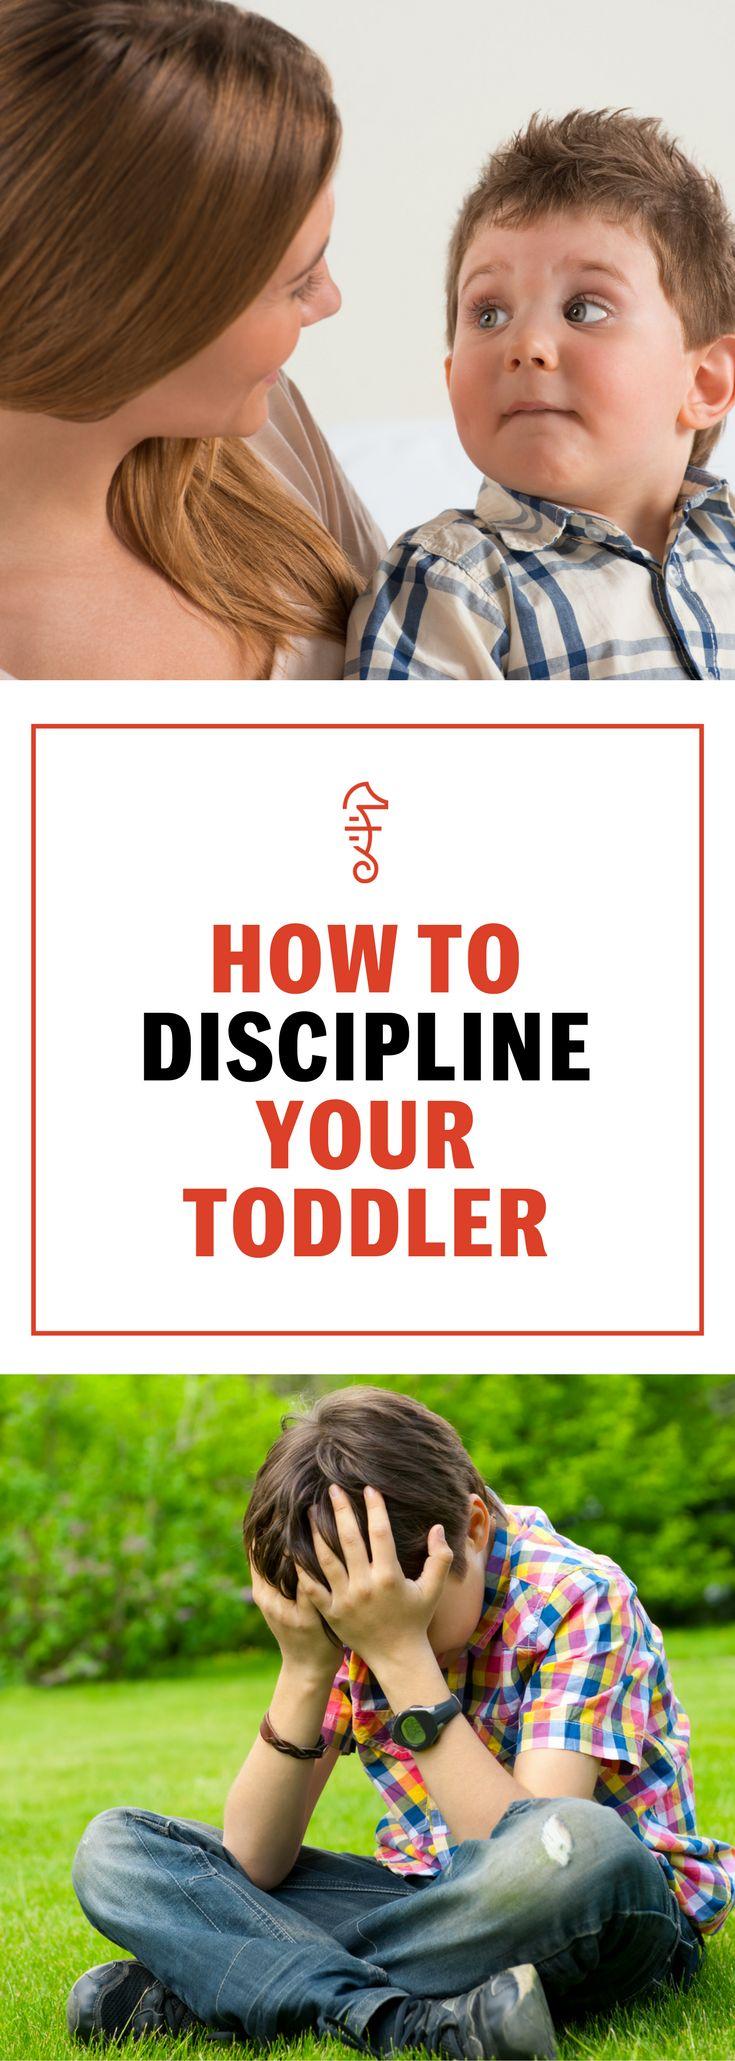 disciplining toddlers, disciplining toddlers baby, disciplining toddlers who hit, misbehaving toddler